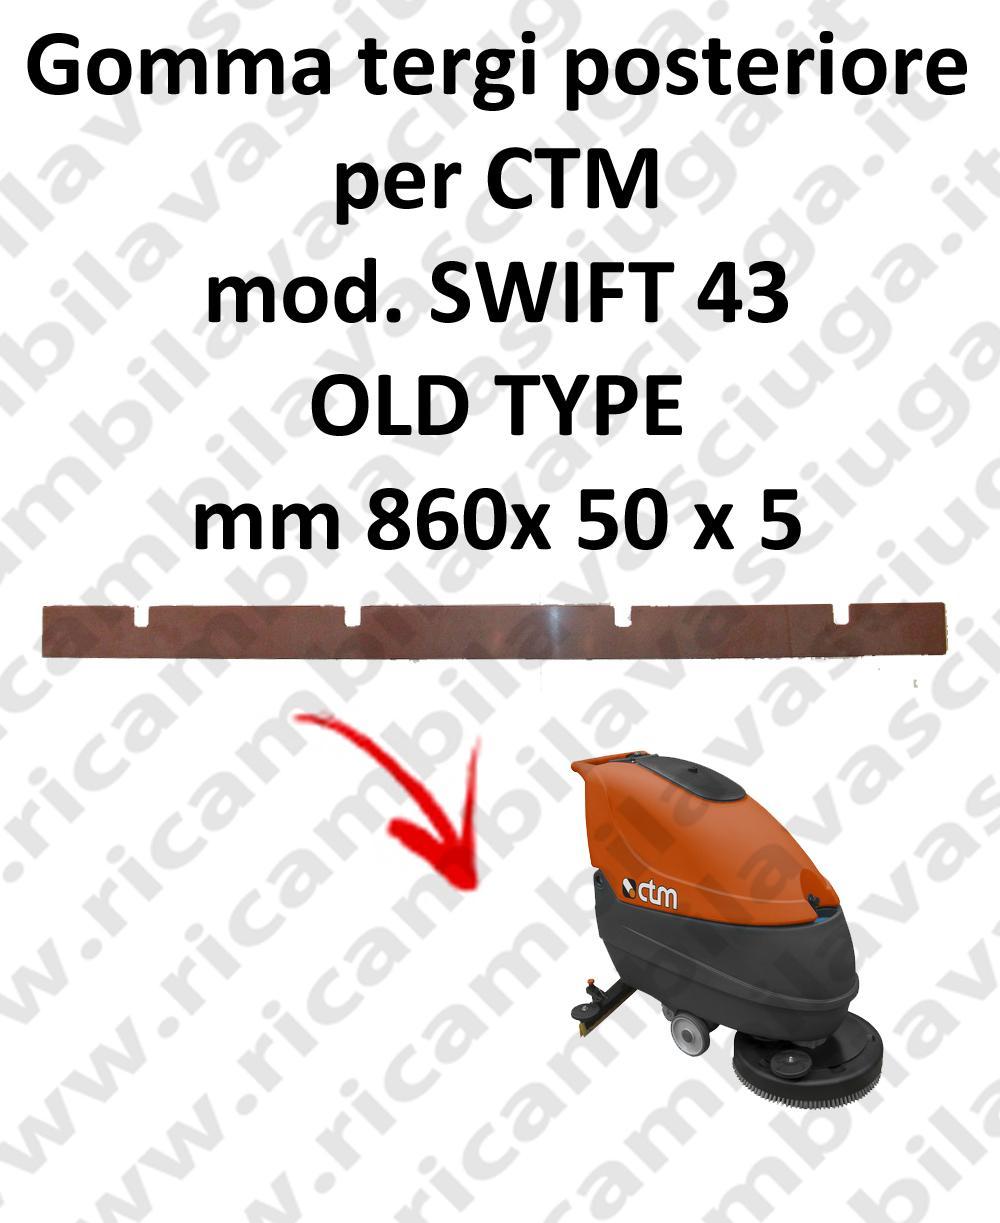 SWIFT 43 OLD TYPE - GOMMA TERGI posteriore per lavapavimenti CTM